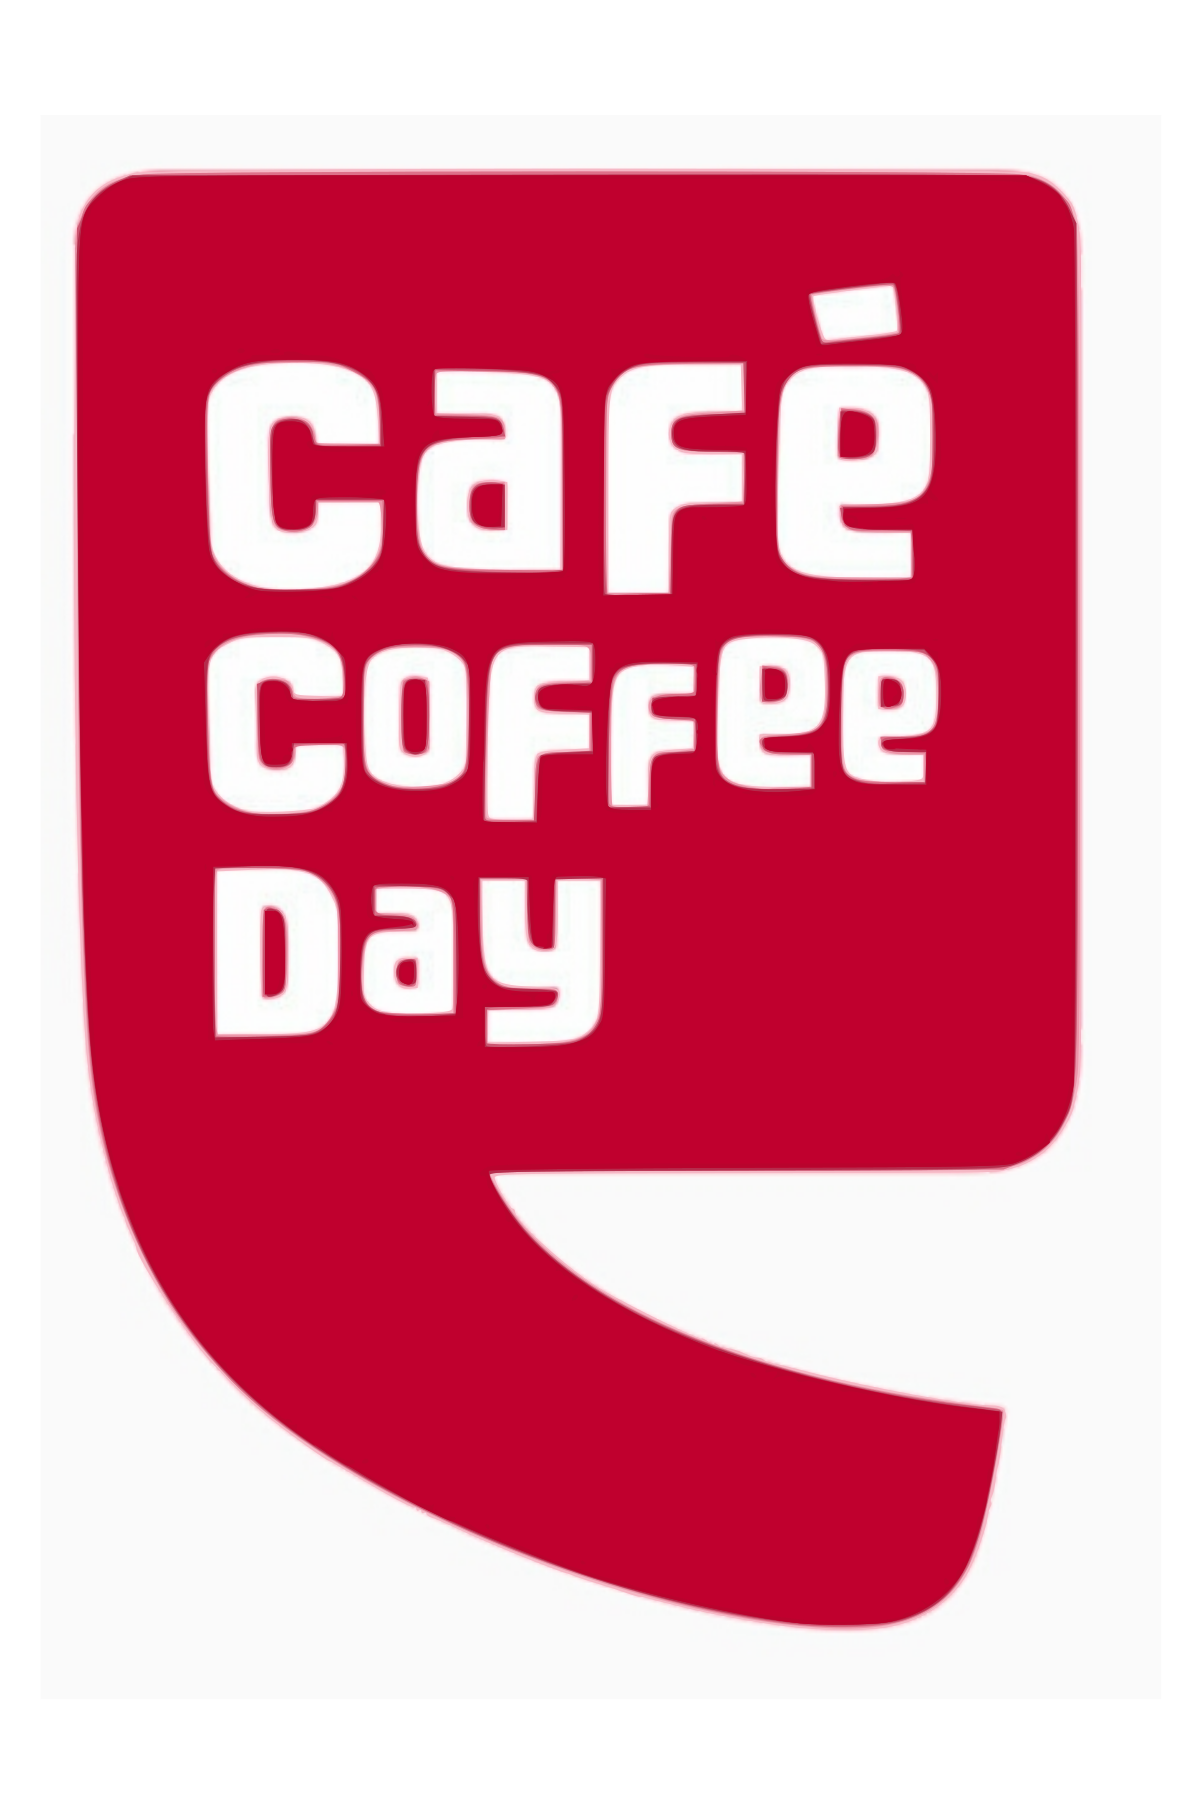 Cafe Coffee Day - Koramangala 3rd Block - Bangalore Image